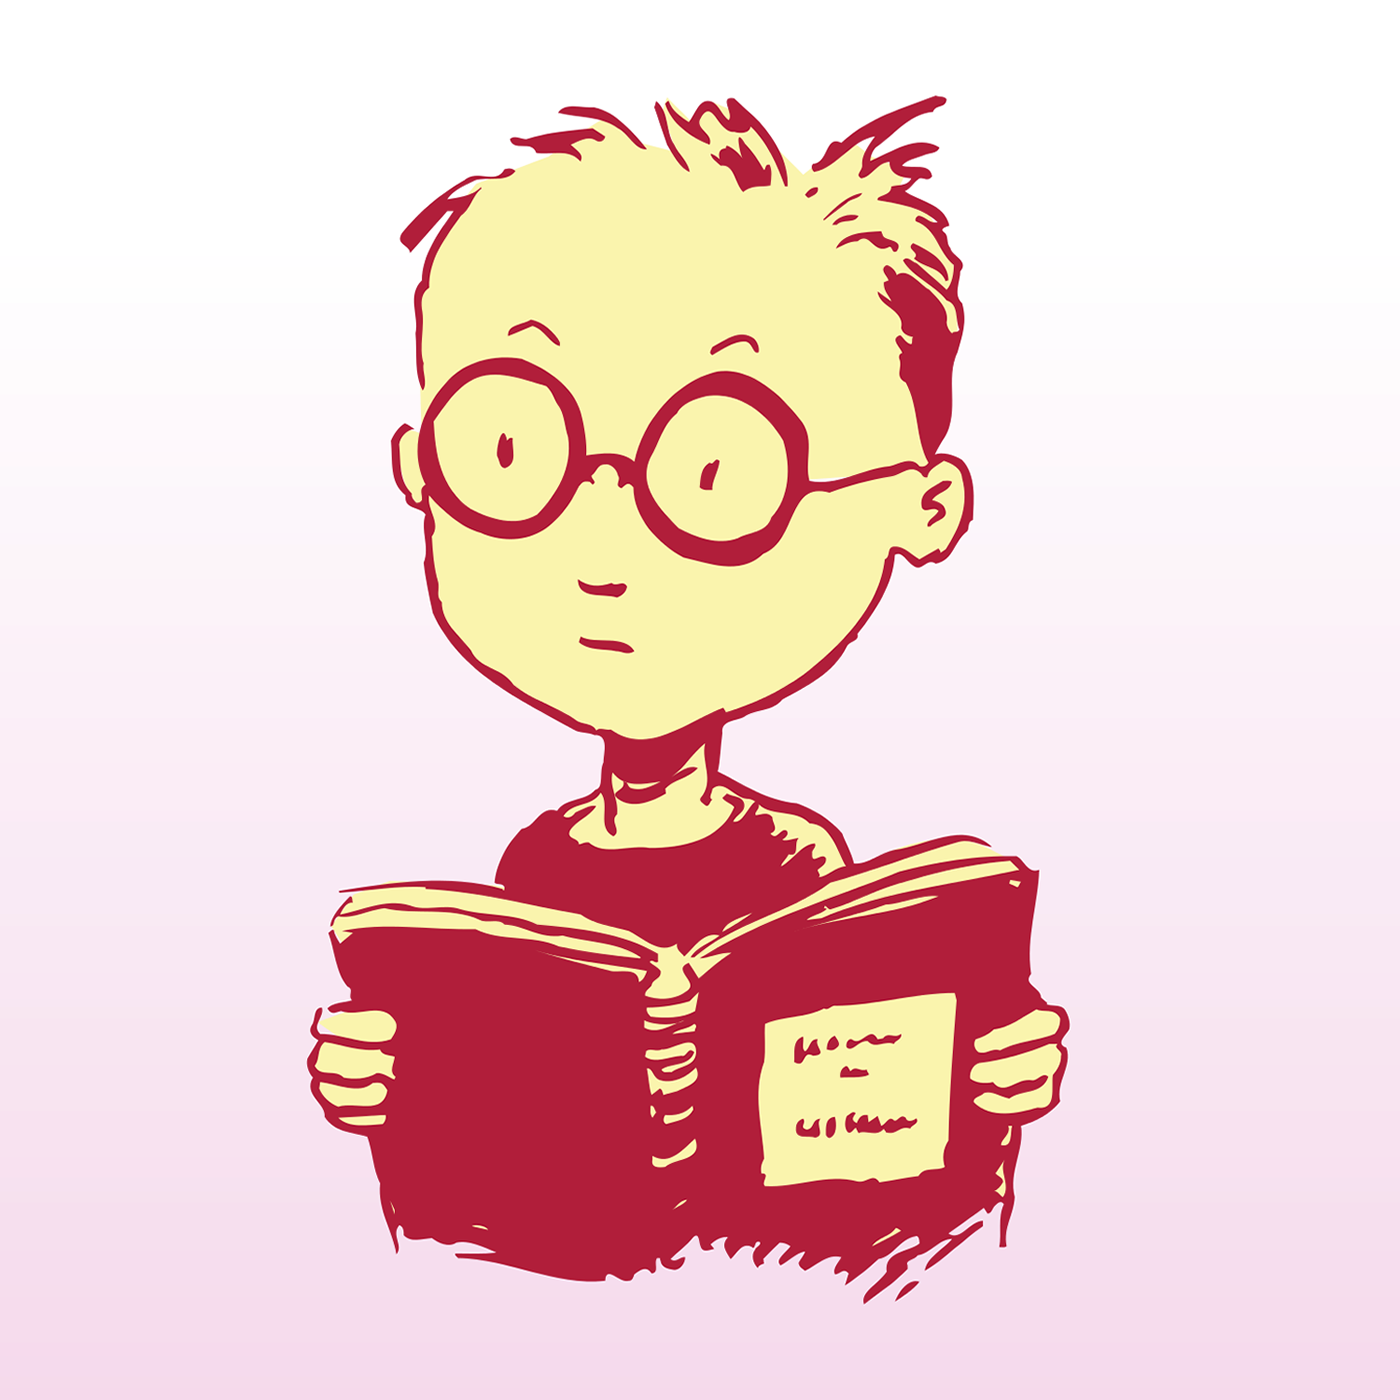 The Dorky Geeky Nerdy Trivia Podcast